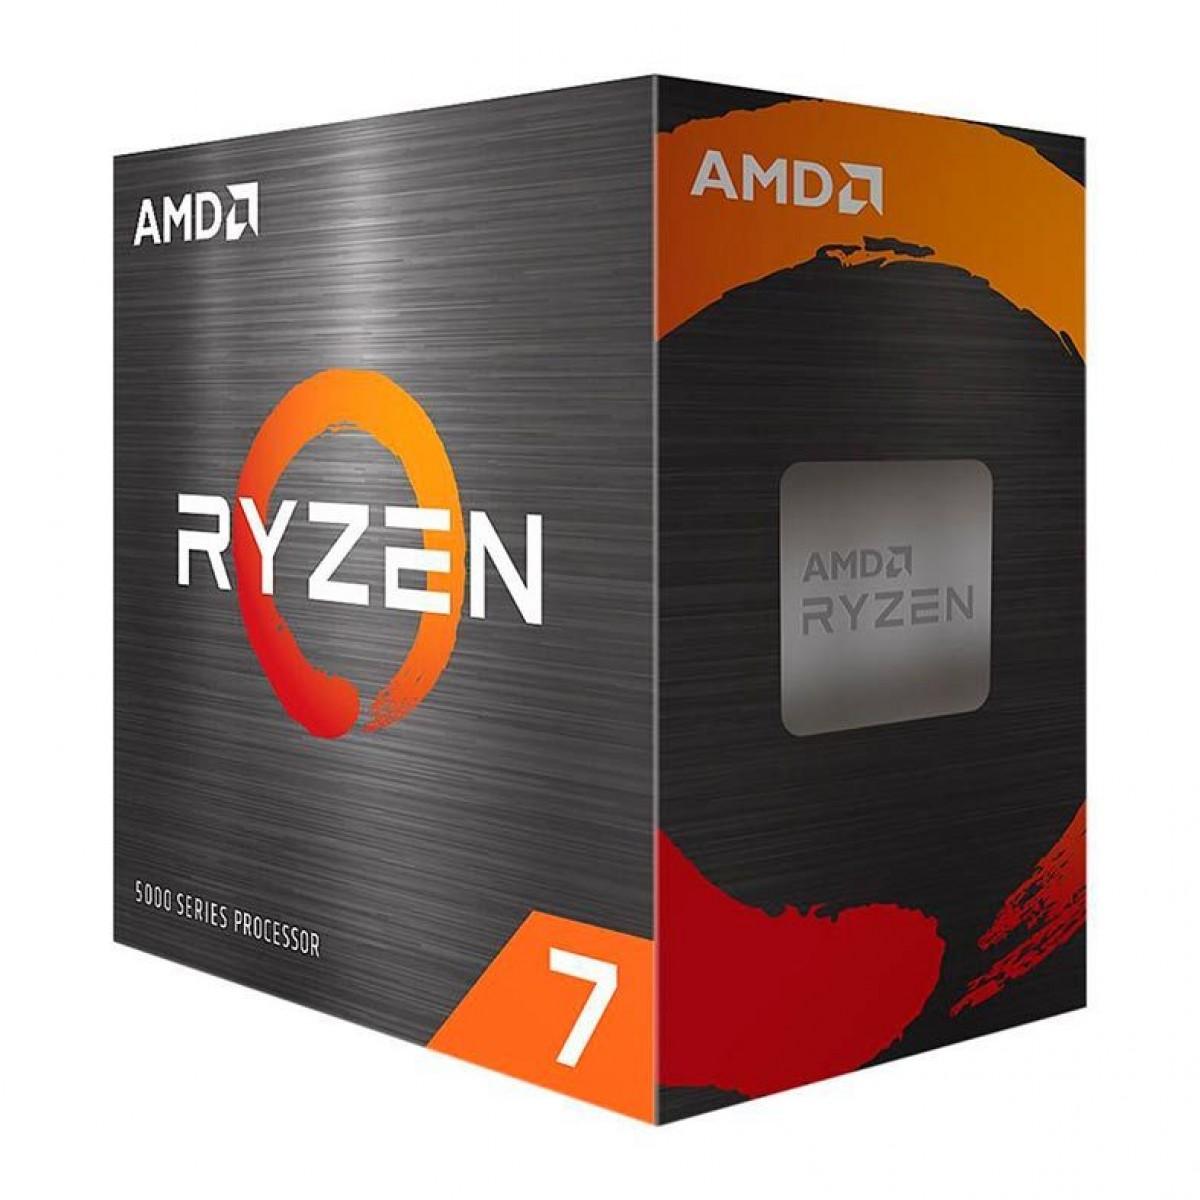 Kit Upgrade, AsRock A520M-HDV + AMD Ryzen 7 5700G + Memória DDR4, 16GB 3000MHz